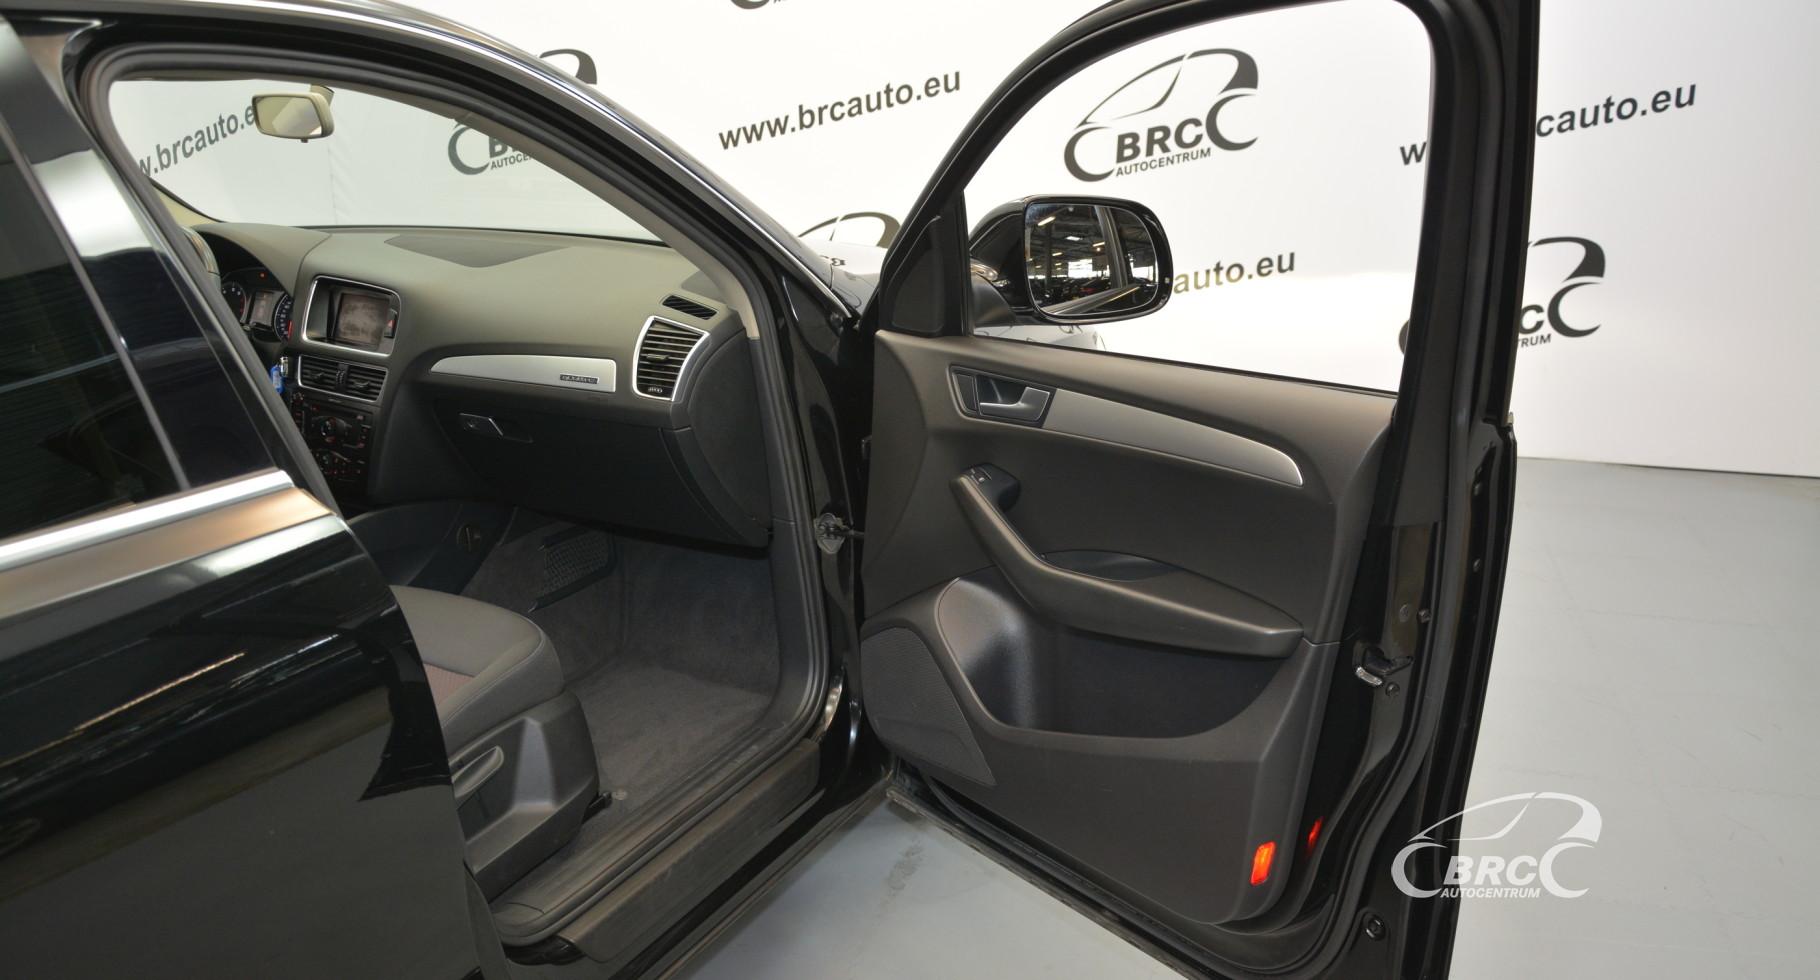 Audi Q5 2.0 TFSI Automatas